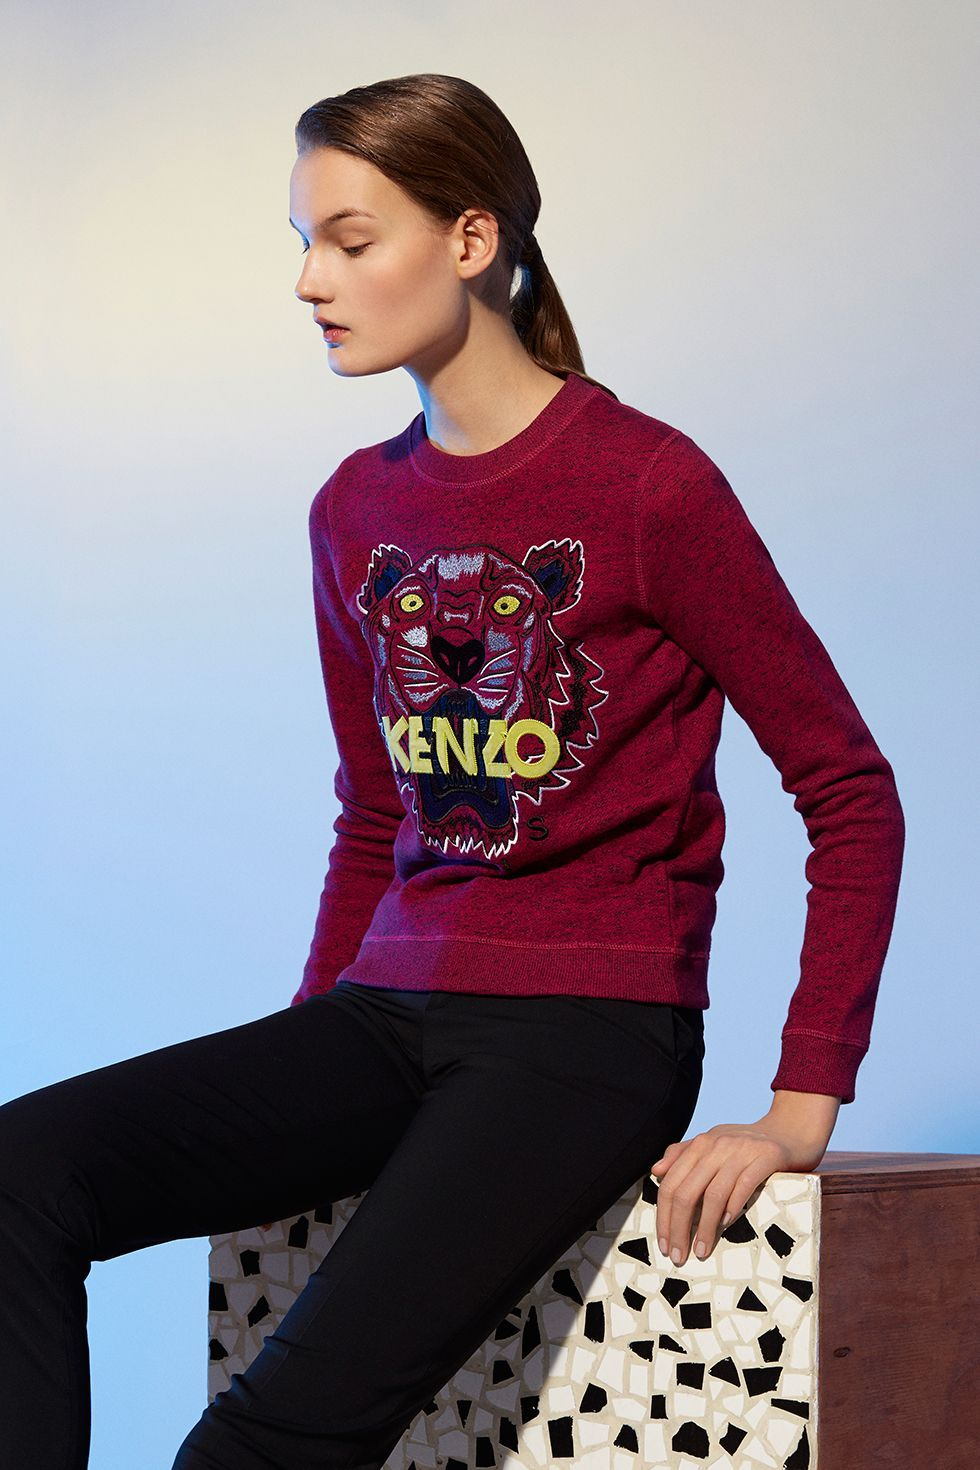 Kenzo Tiger Sweatshirt - Kenzo Sweatshirts   Sweaters Women - Kenzo E-shop d6156dd675